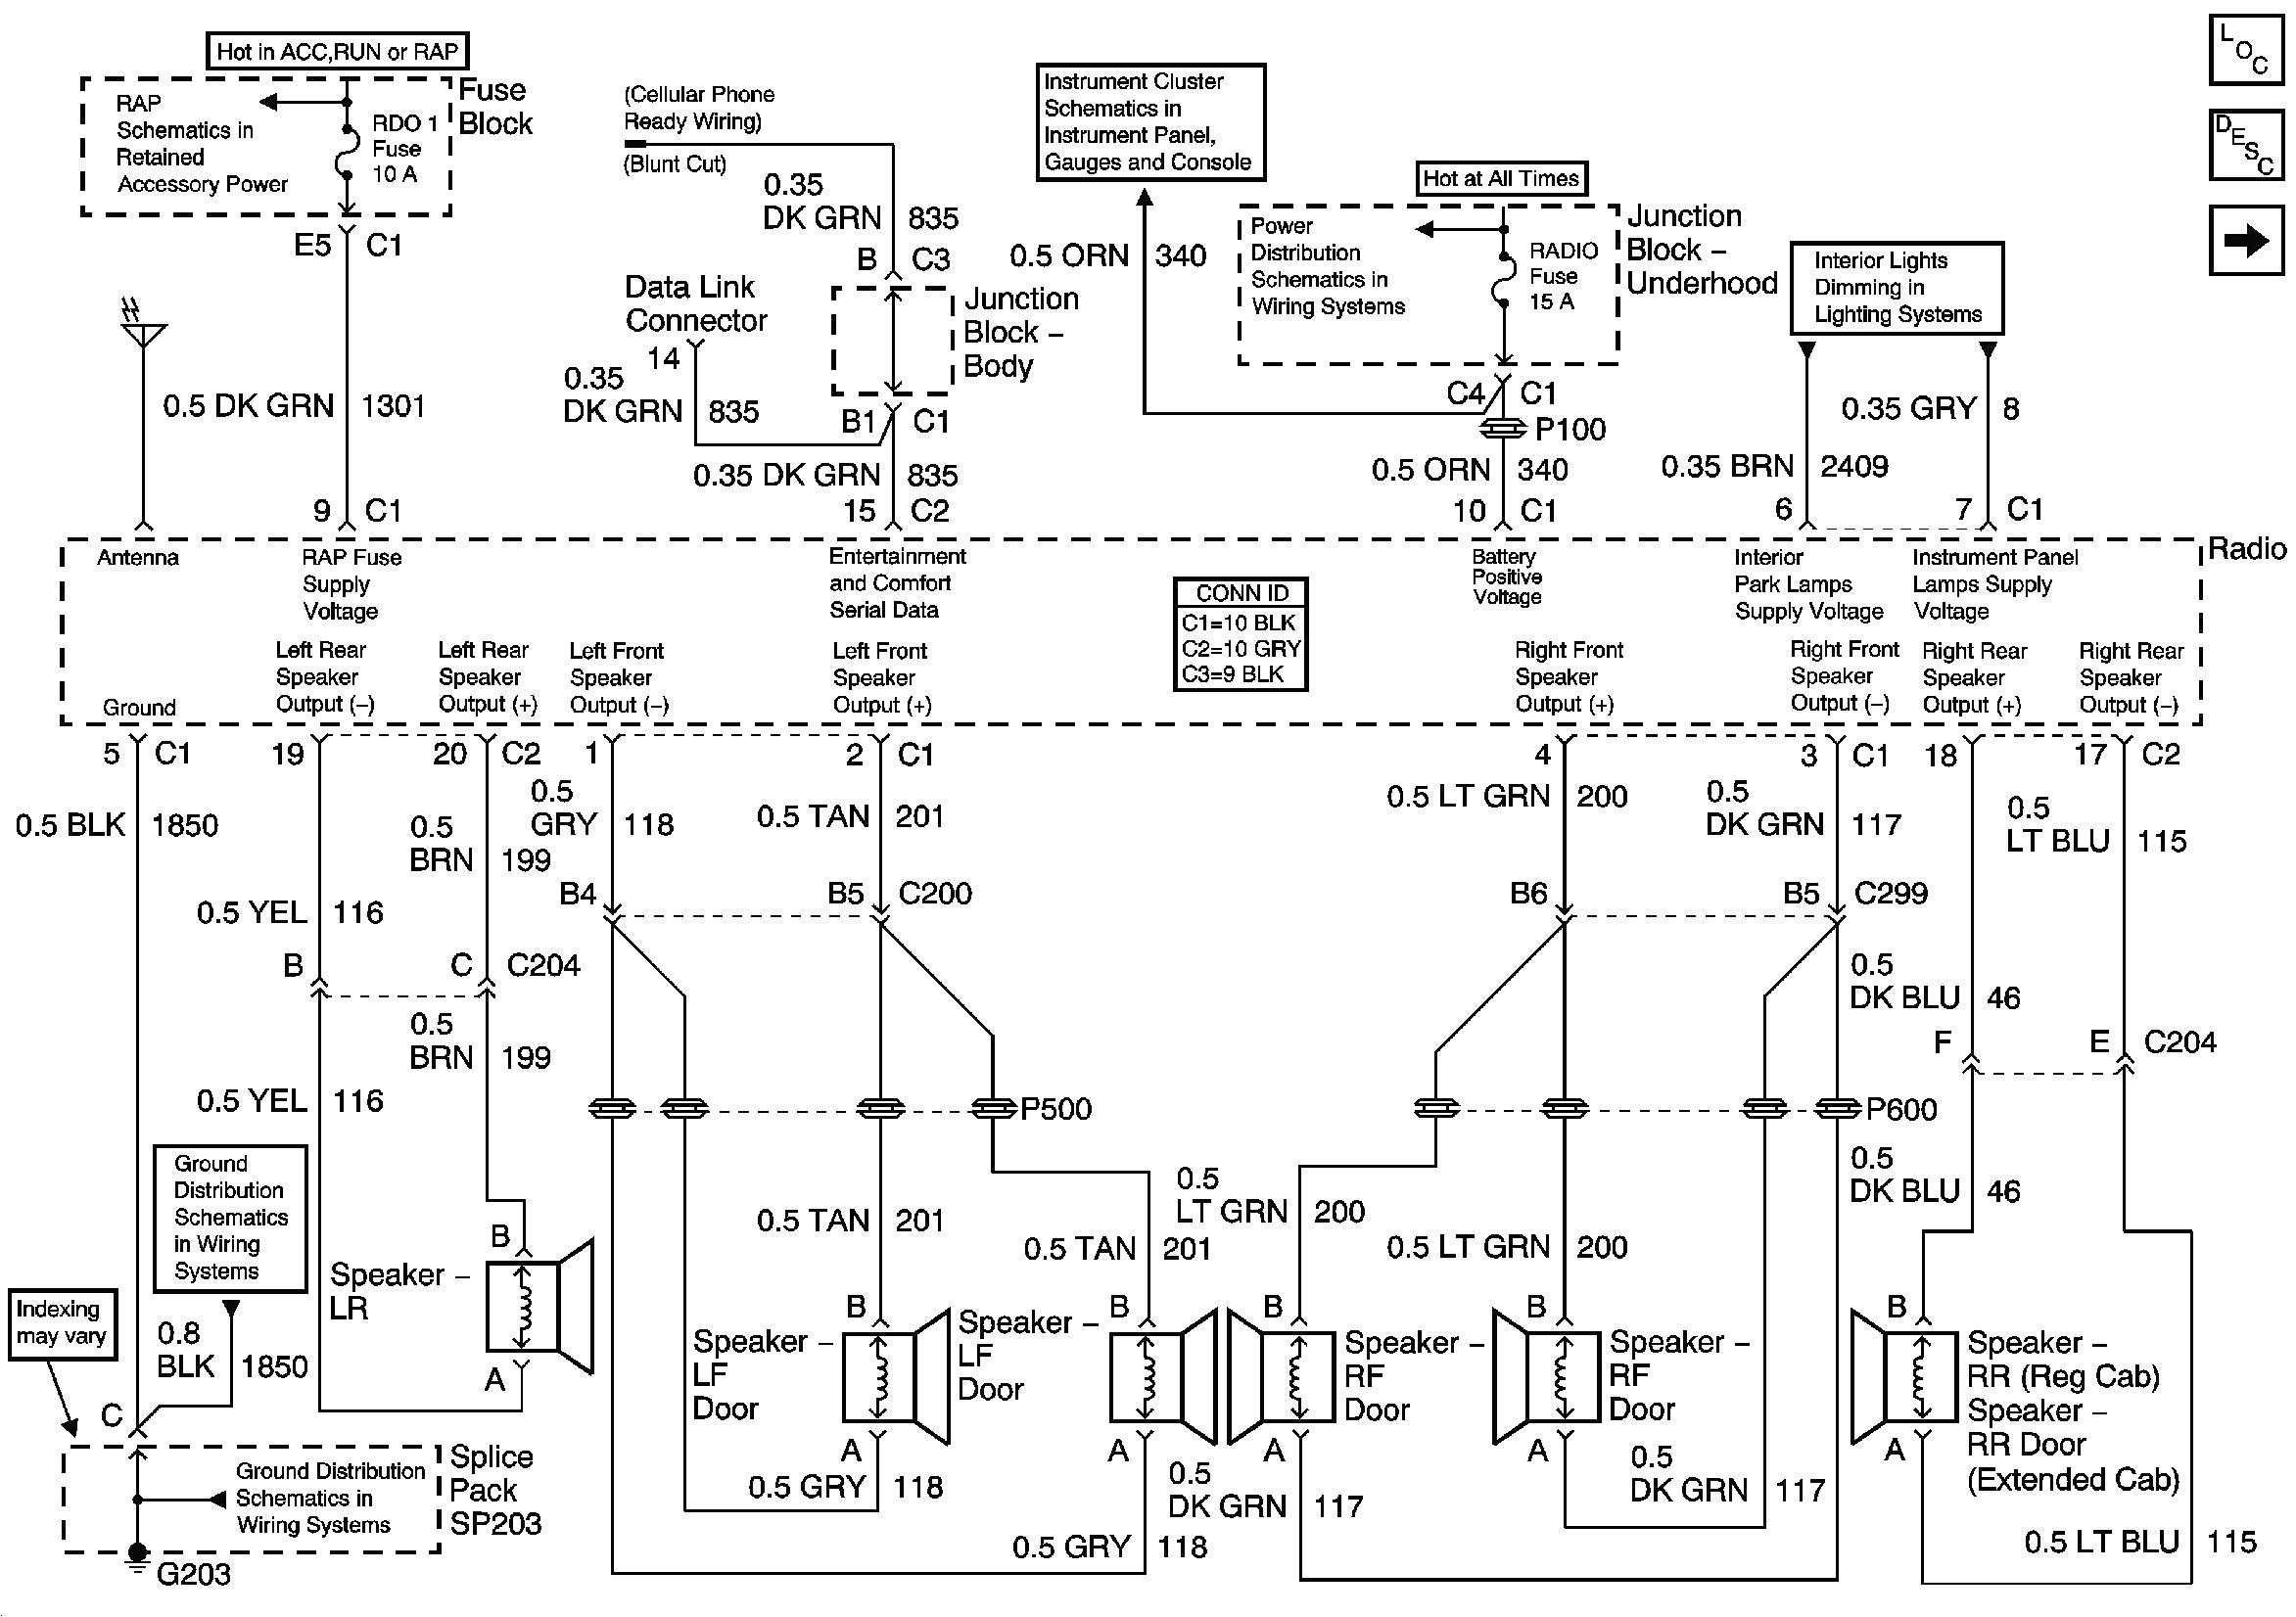 98 cavalier headlight wiring diagram wiring diagram toolbox cavalier headlight wiring diagram 2001 cavalier headlight wiring